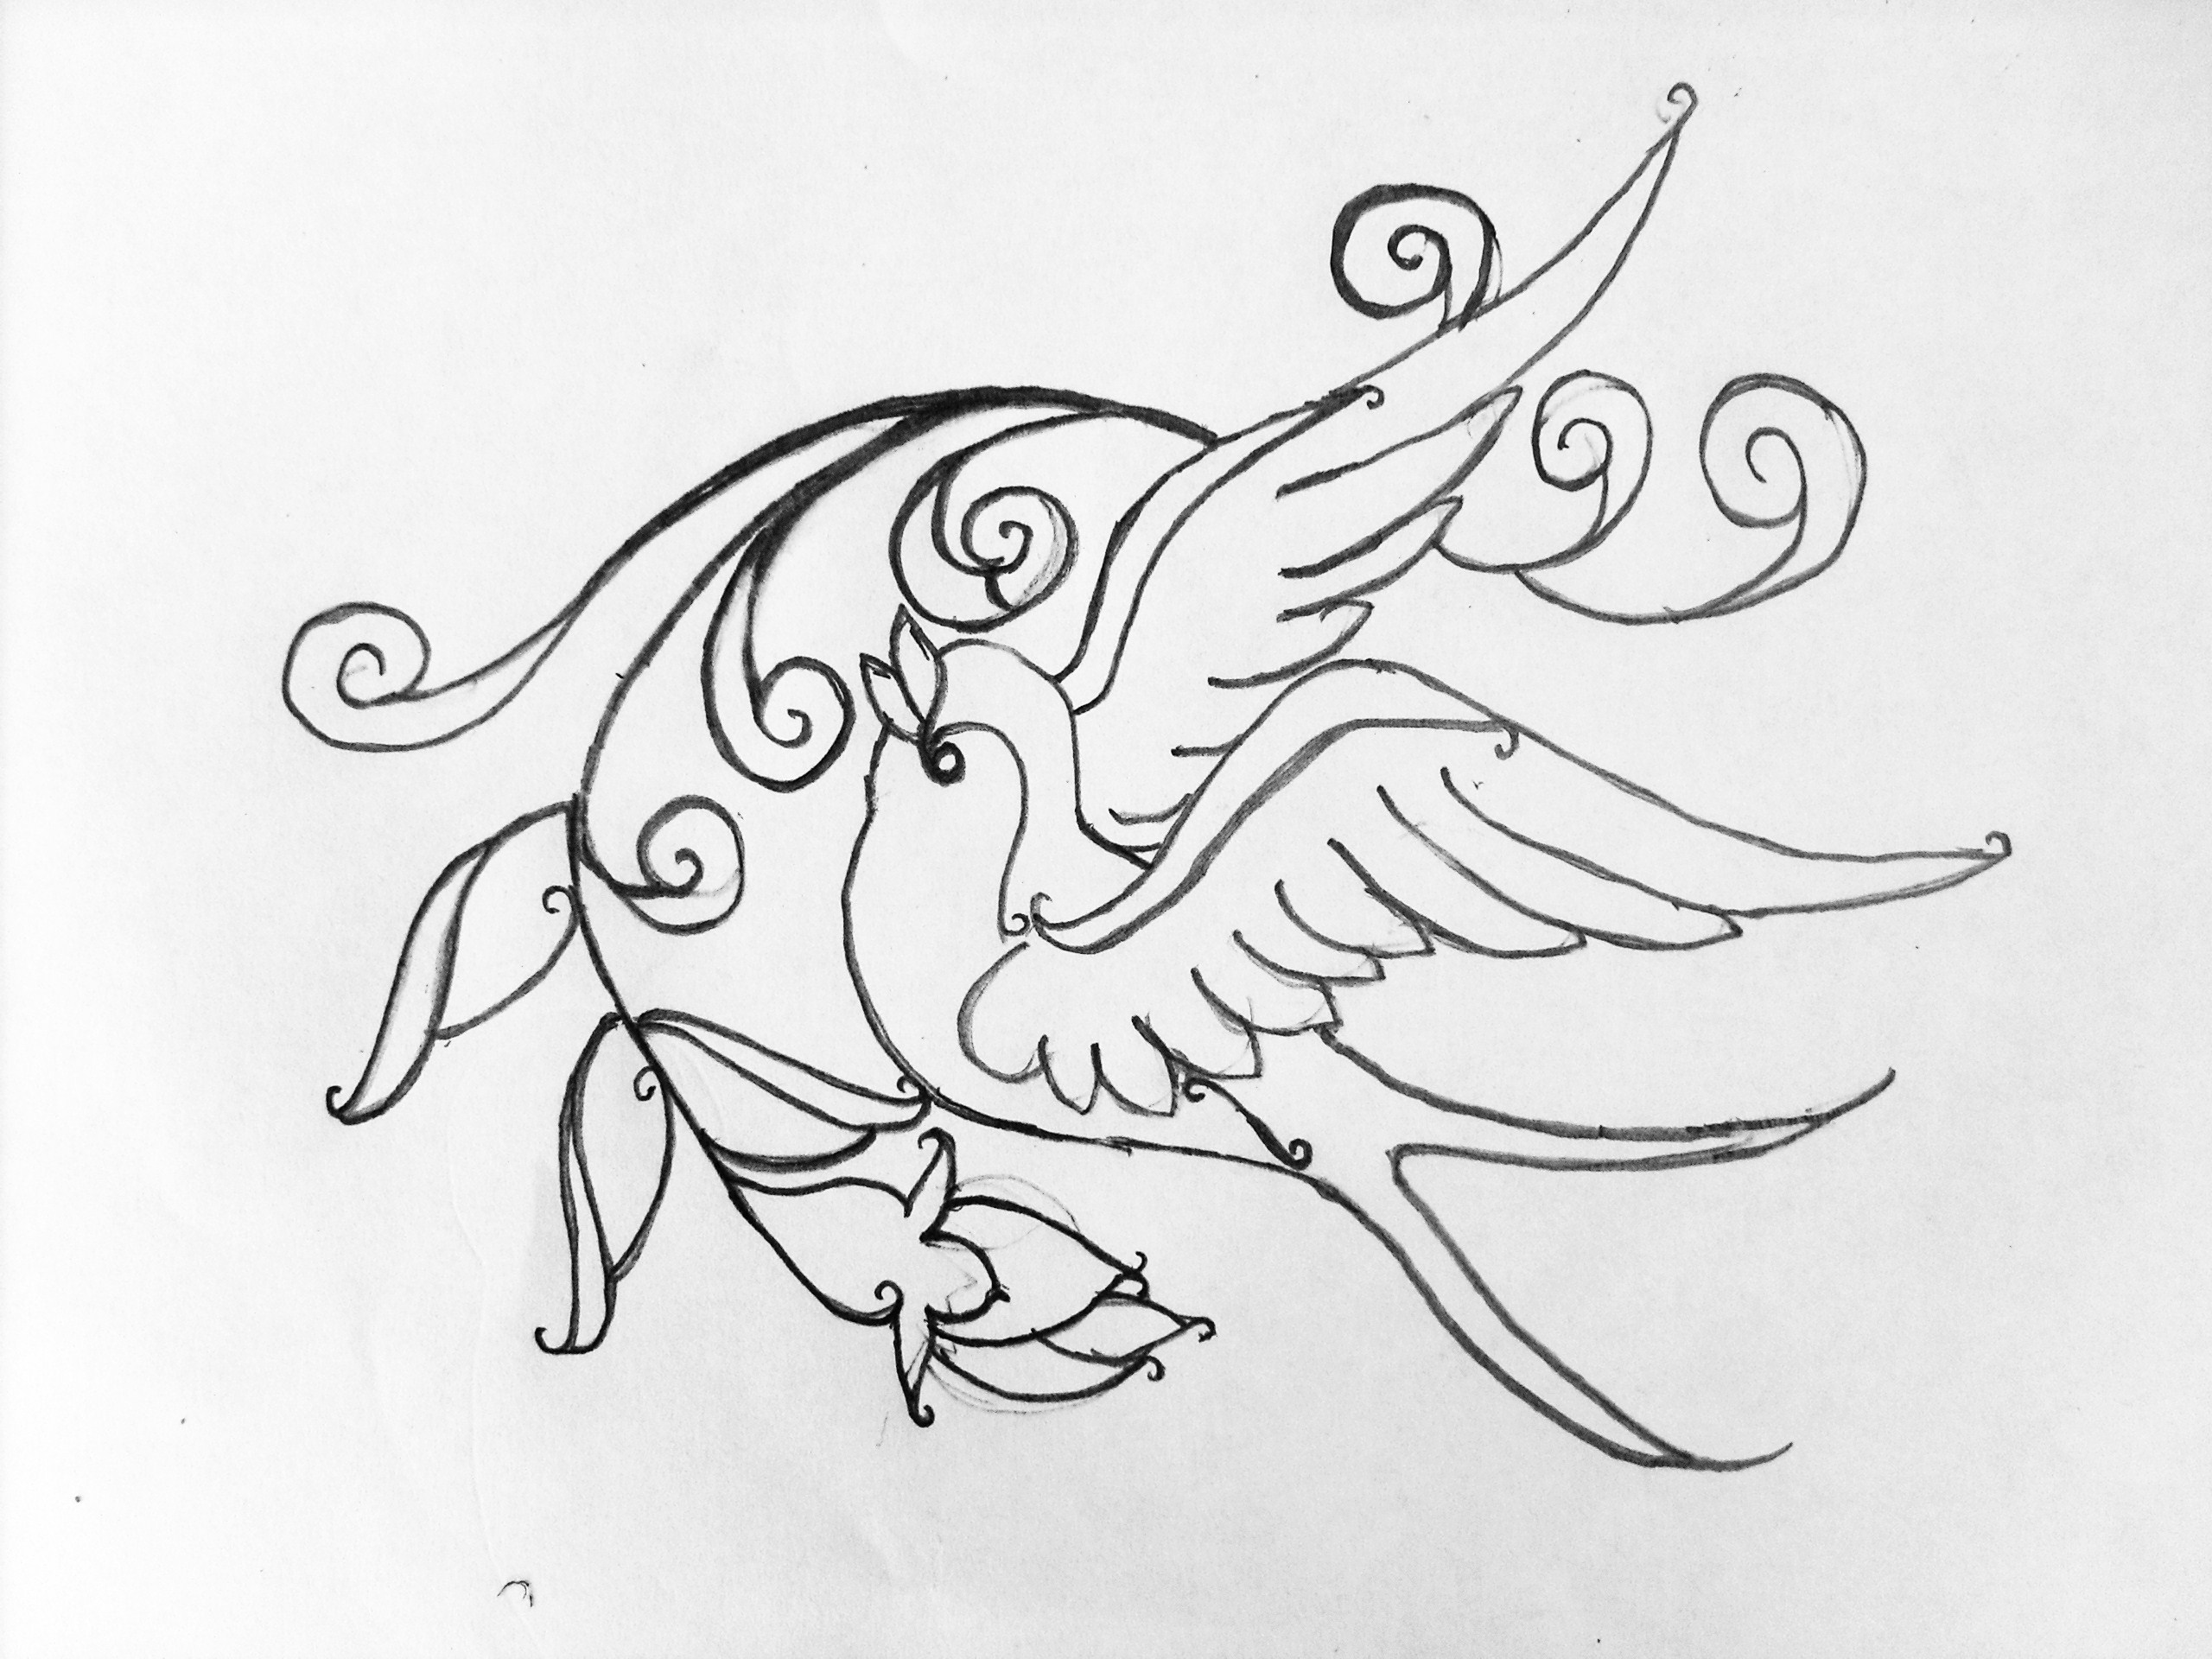 Swallow Tattoo Line Drawing : Swallow and rosebud by racheldee on deviantart